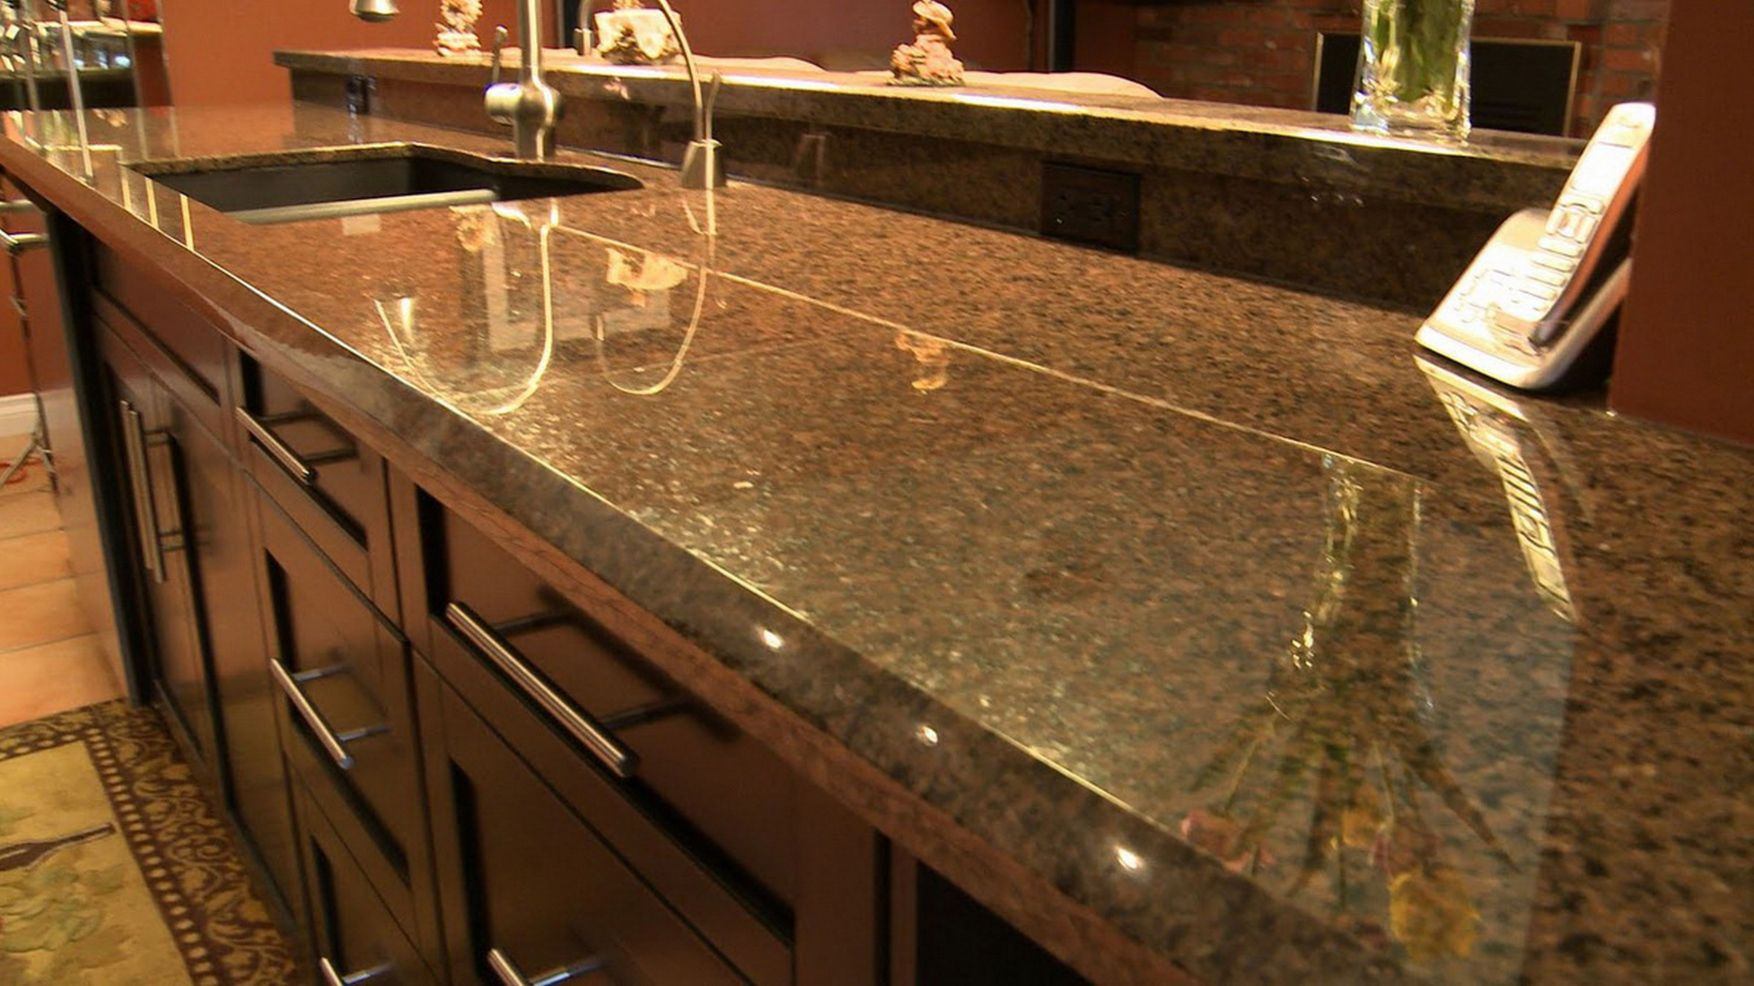 99 Best Prices For Granite Countertops Kitchen Island Countertop Ideas Replacing Kitchen Countertops Cost Of Kitchen Countertops Cost Of Countertops